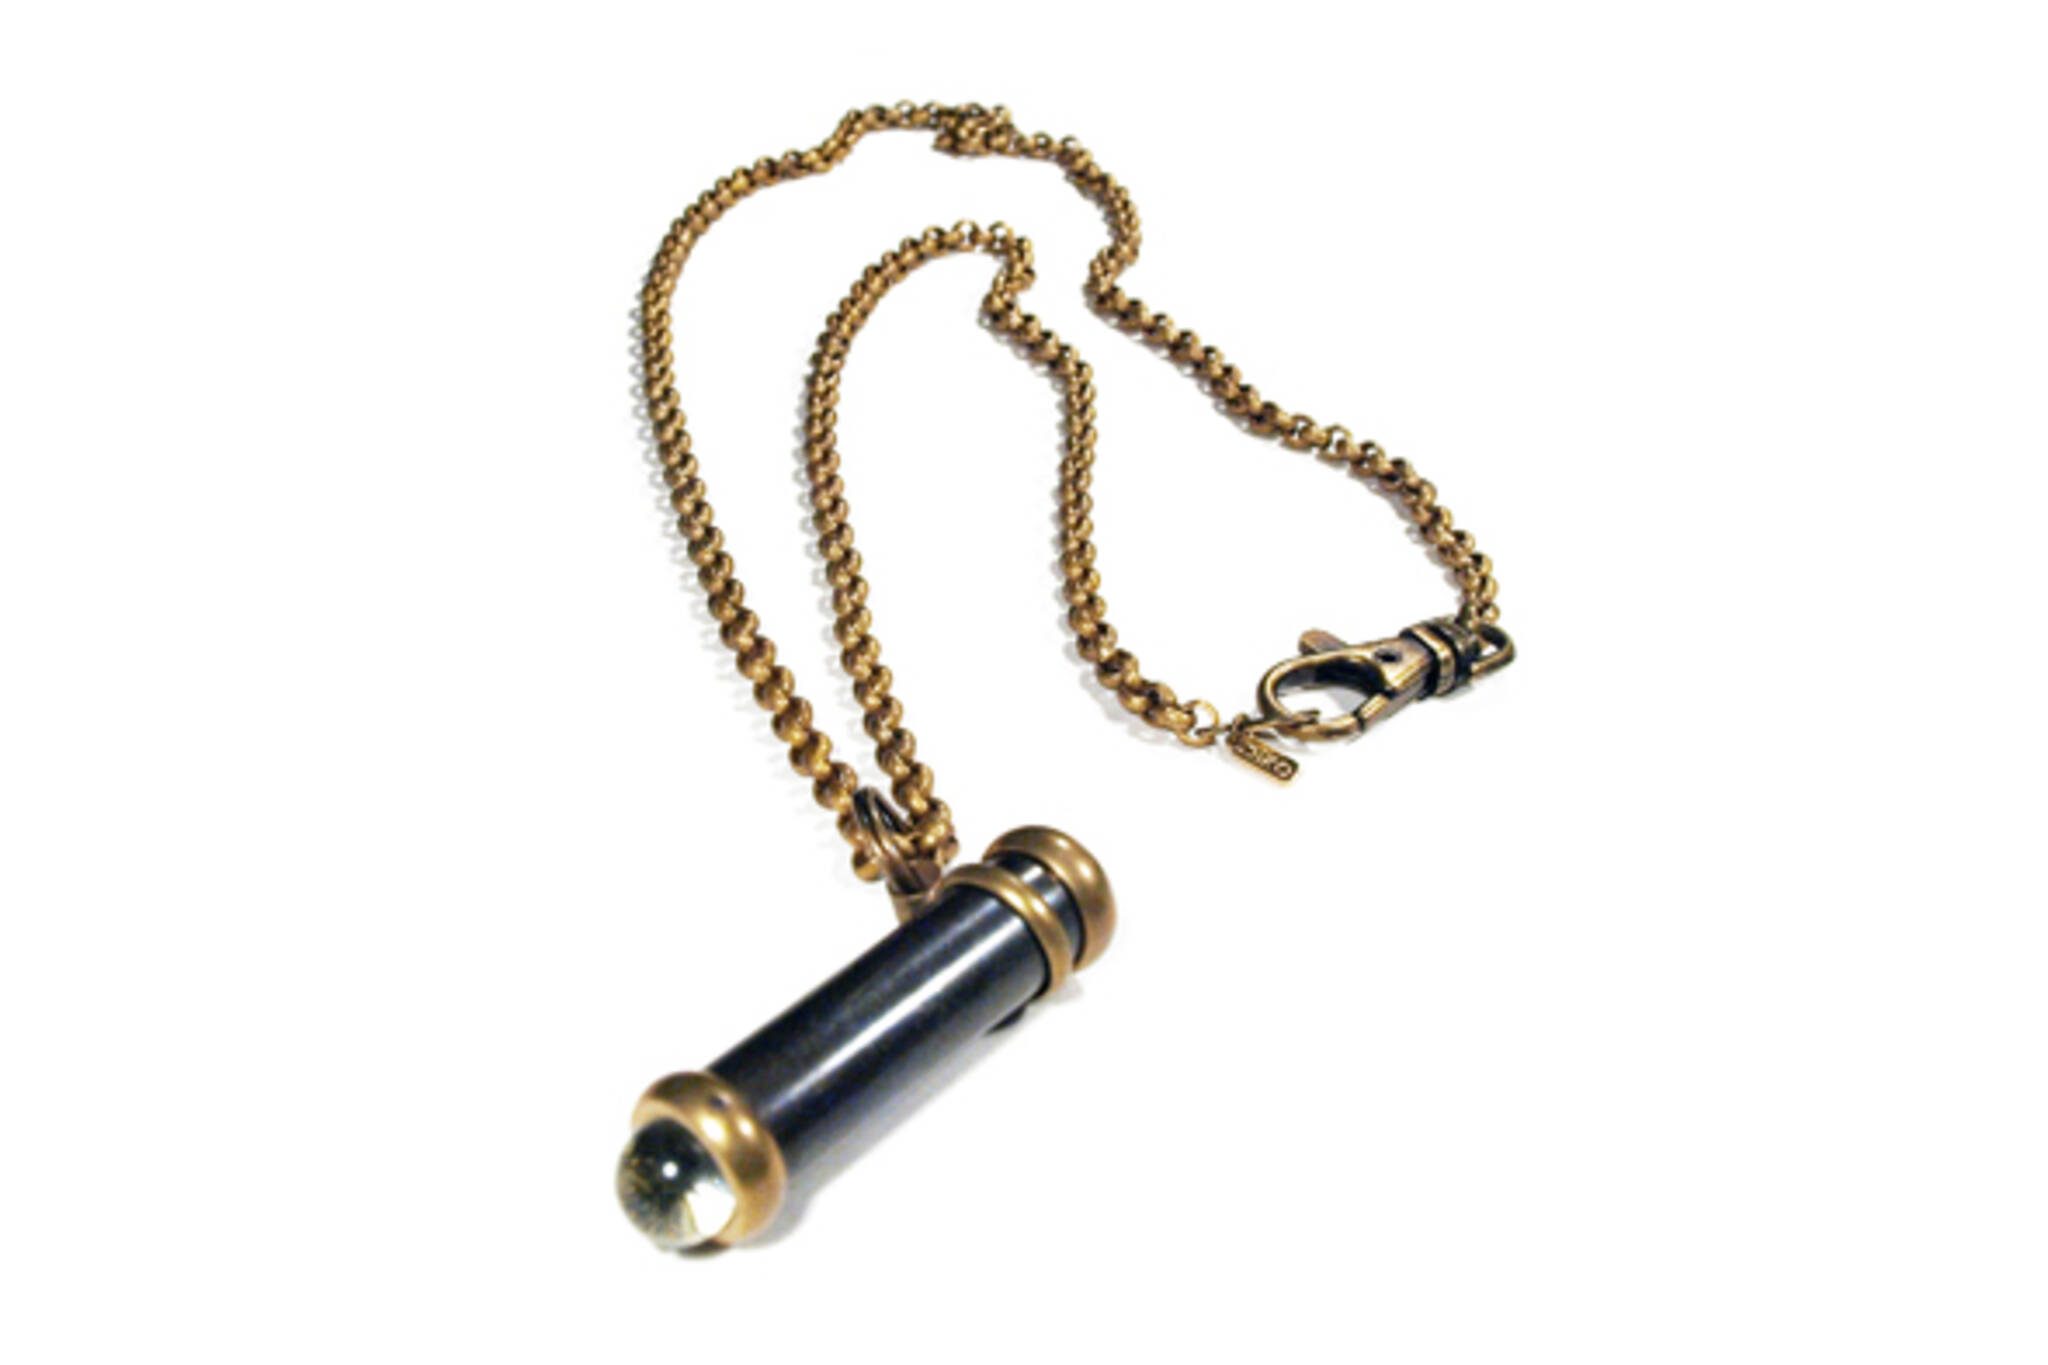 Biko necklace